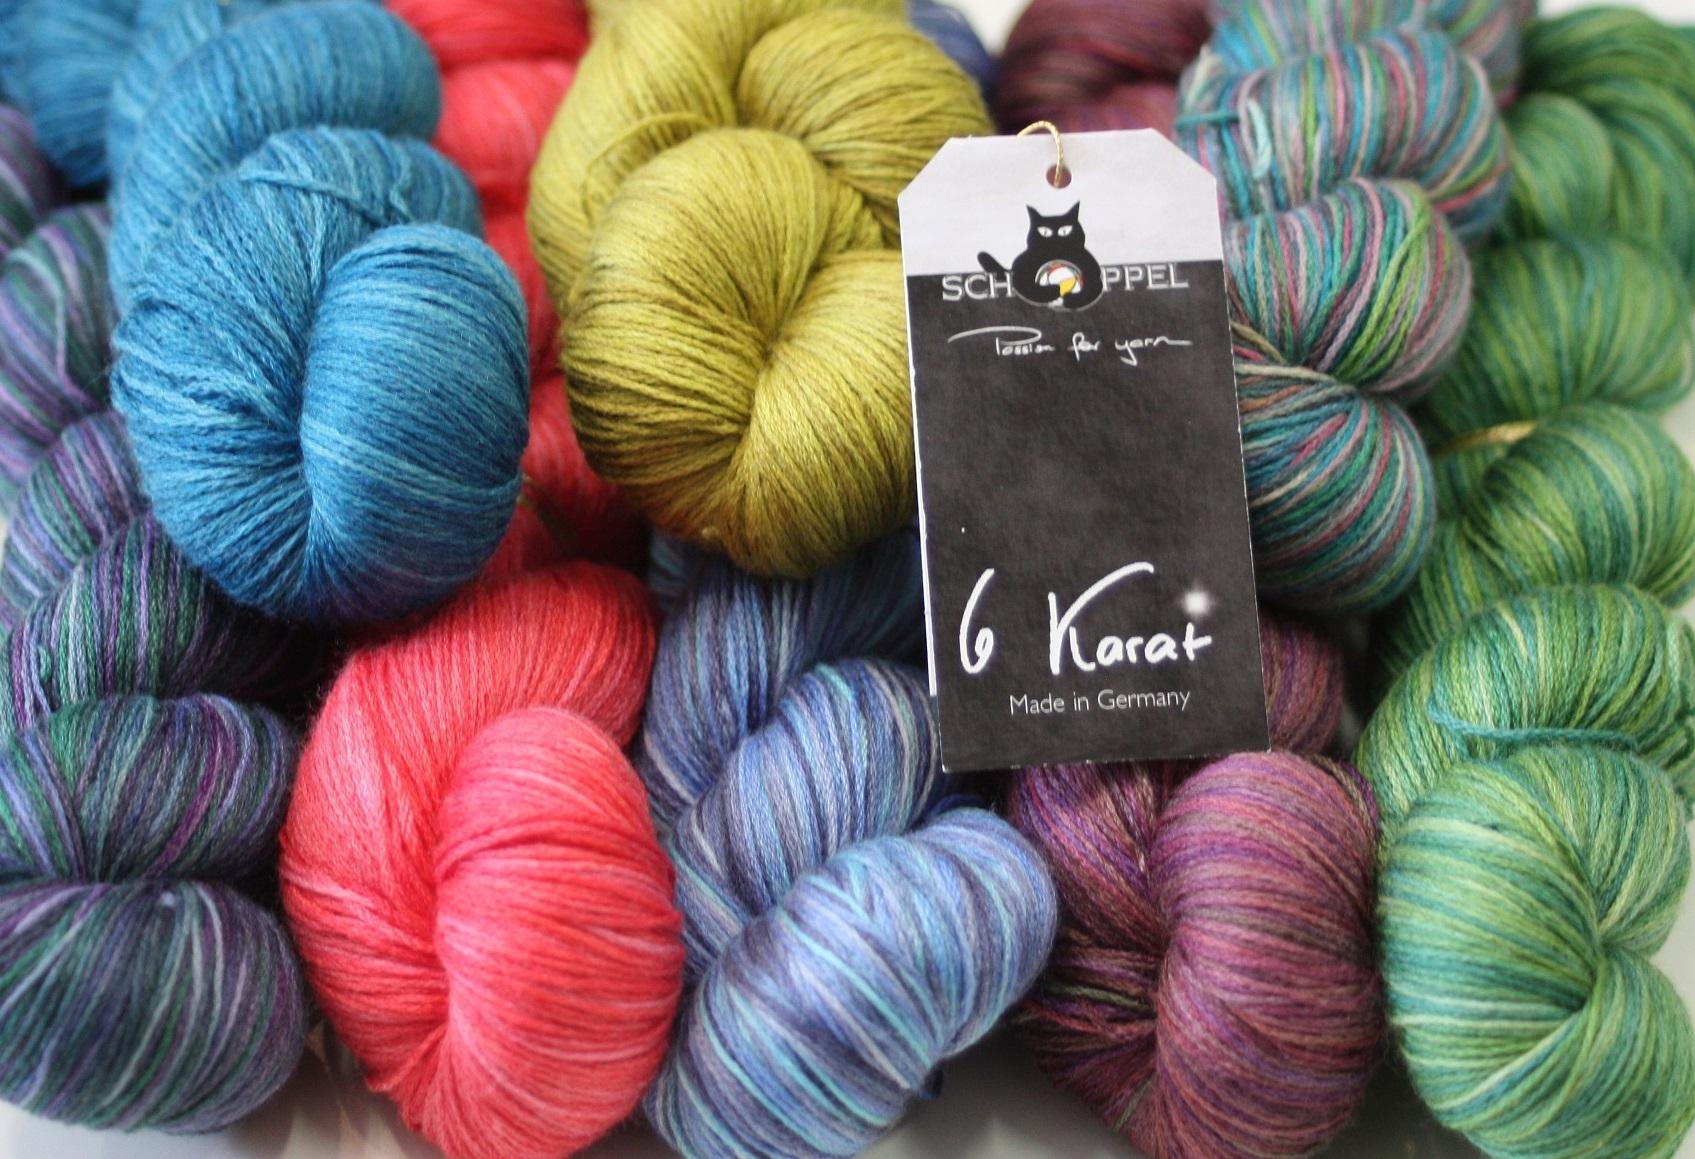 6 Karat Schoppel-Wolle